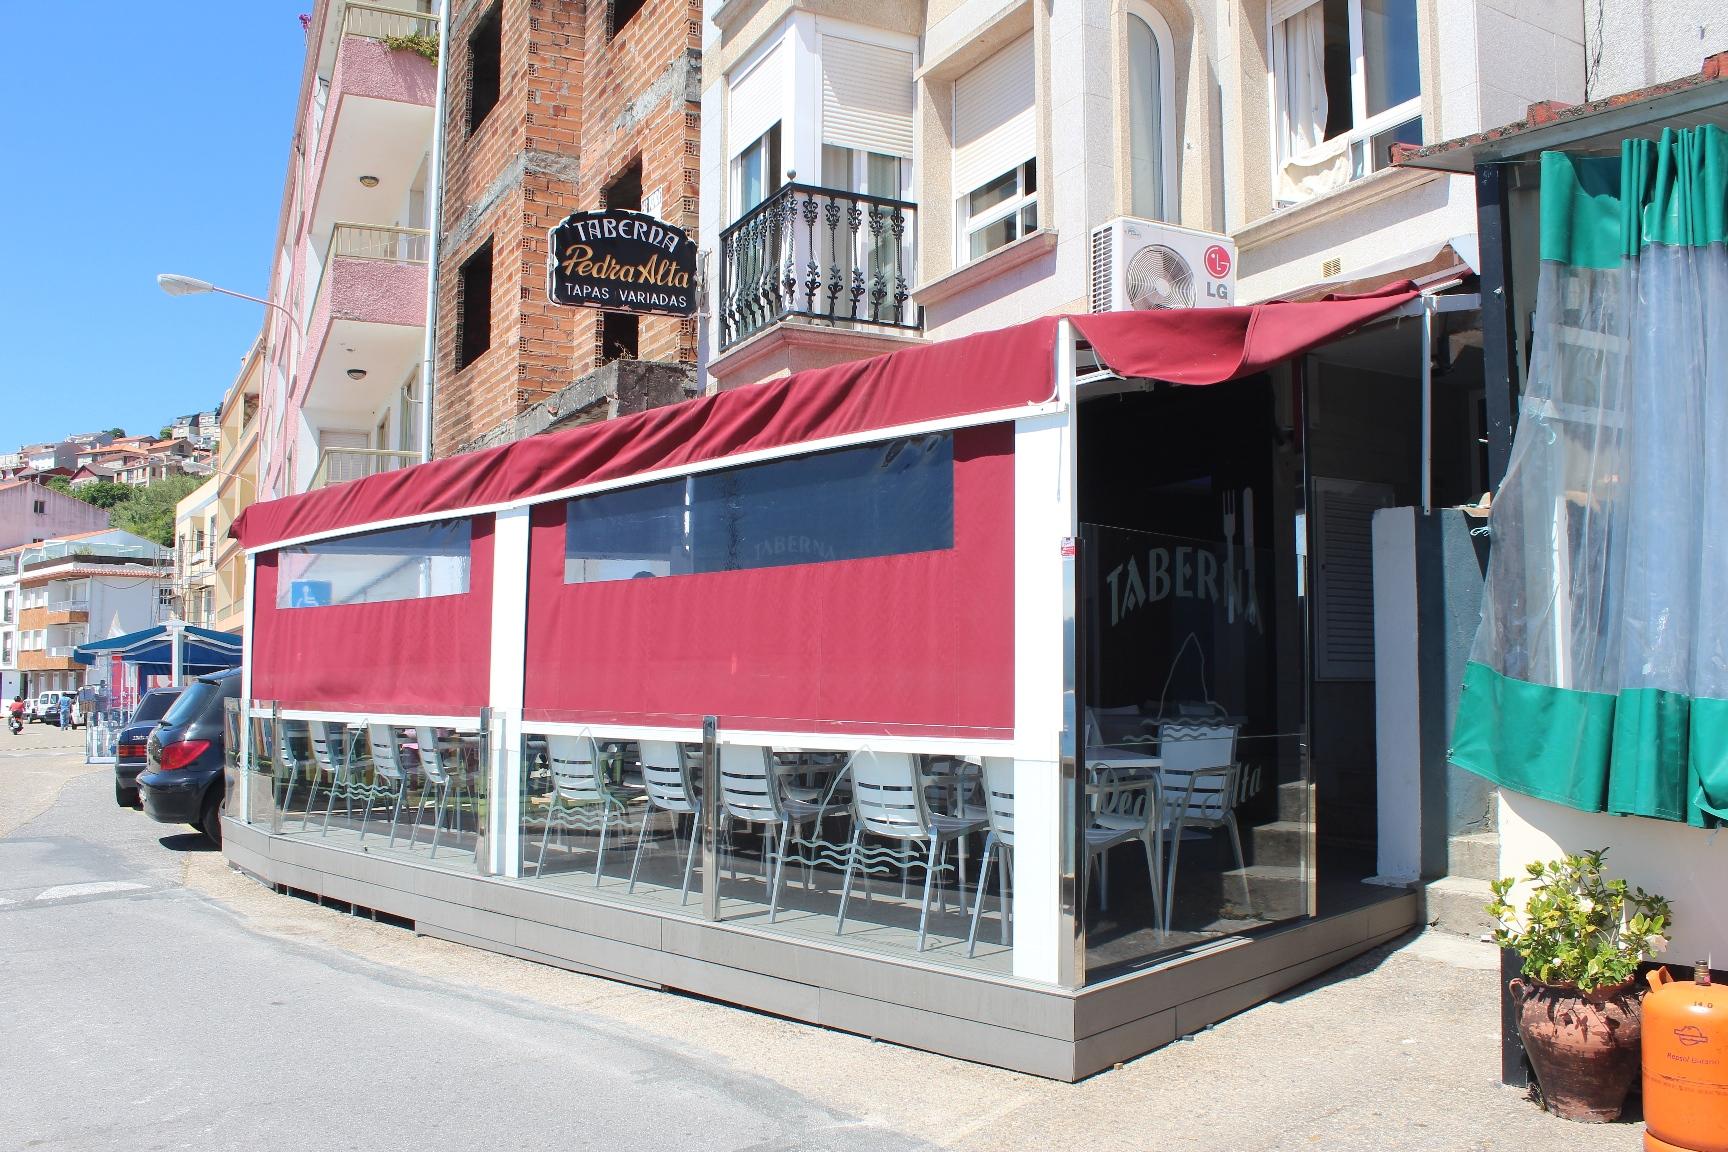 taberna-pedra-alta-restaurante-cocteleria-5